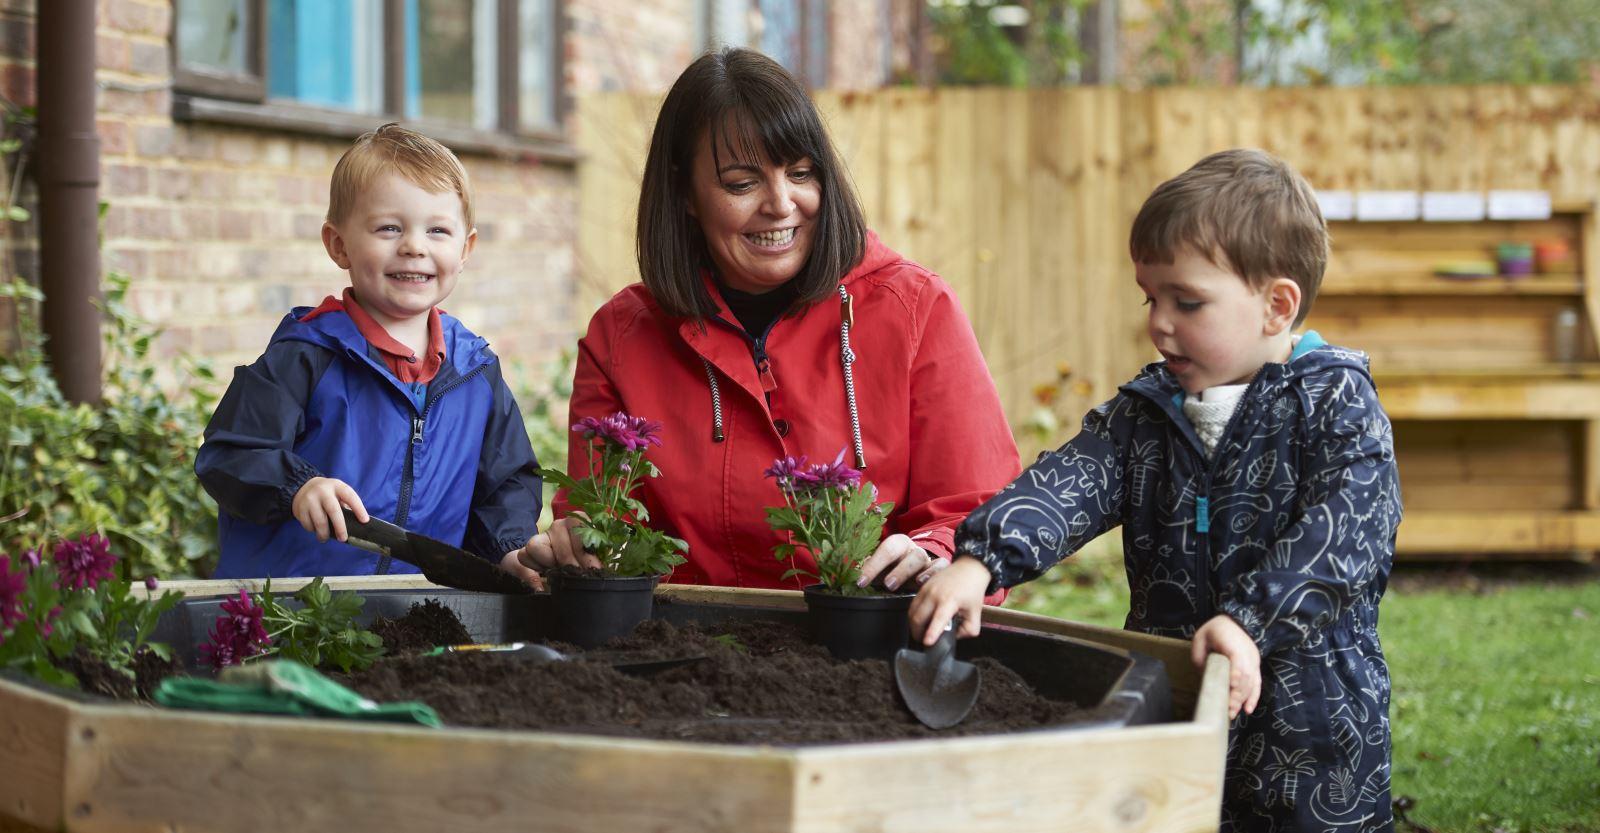 The Webber Nursery's main image